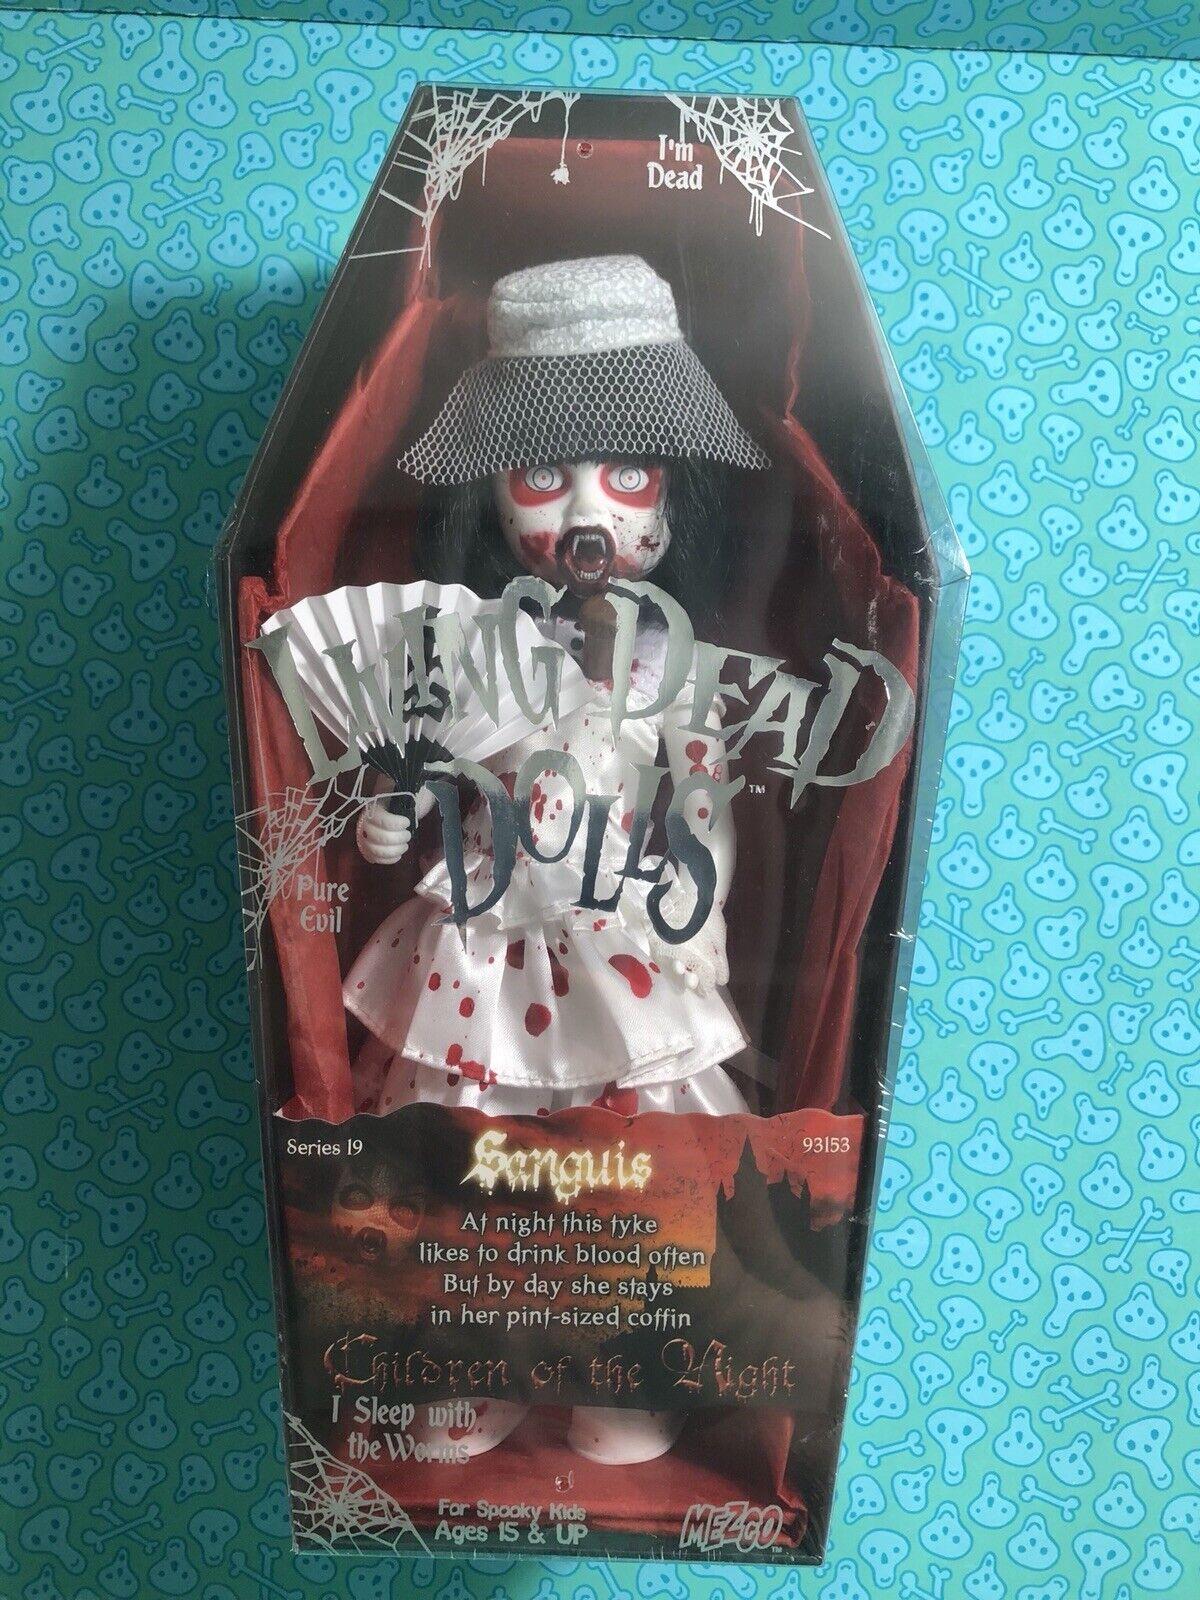 Living Dead Dolls SANGUIS VARIANT - Series 19 - SEALED - Vampire